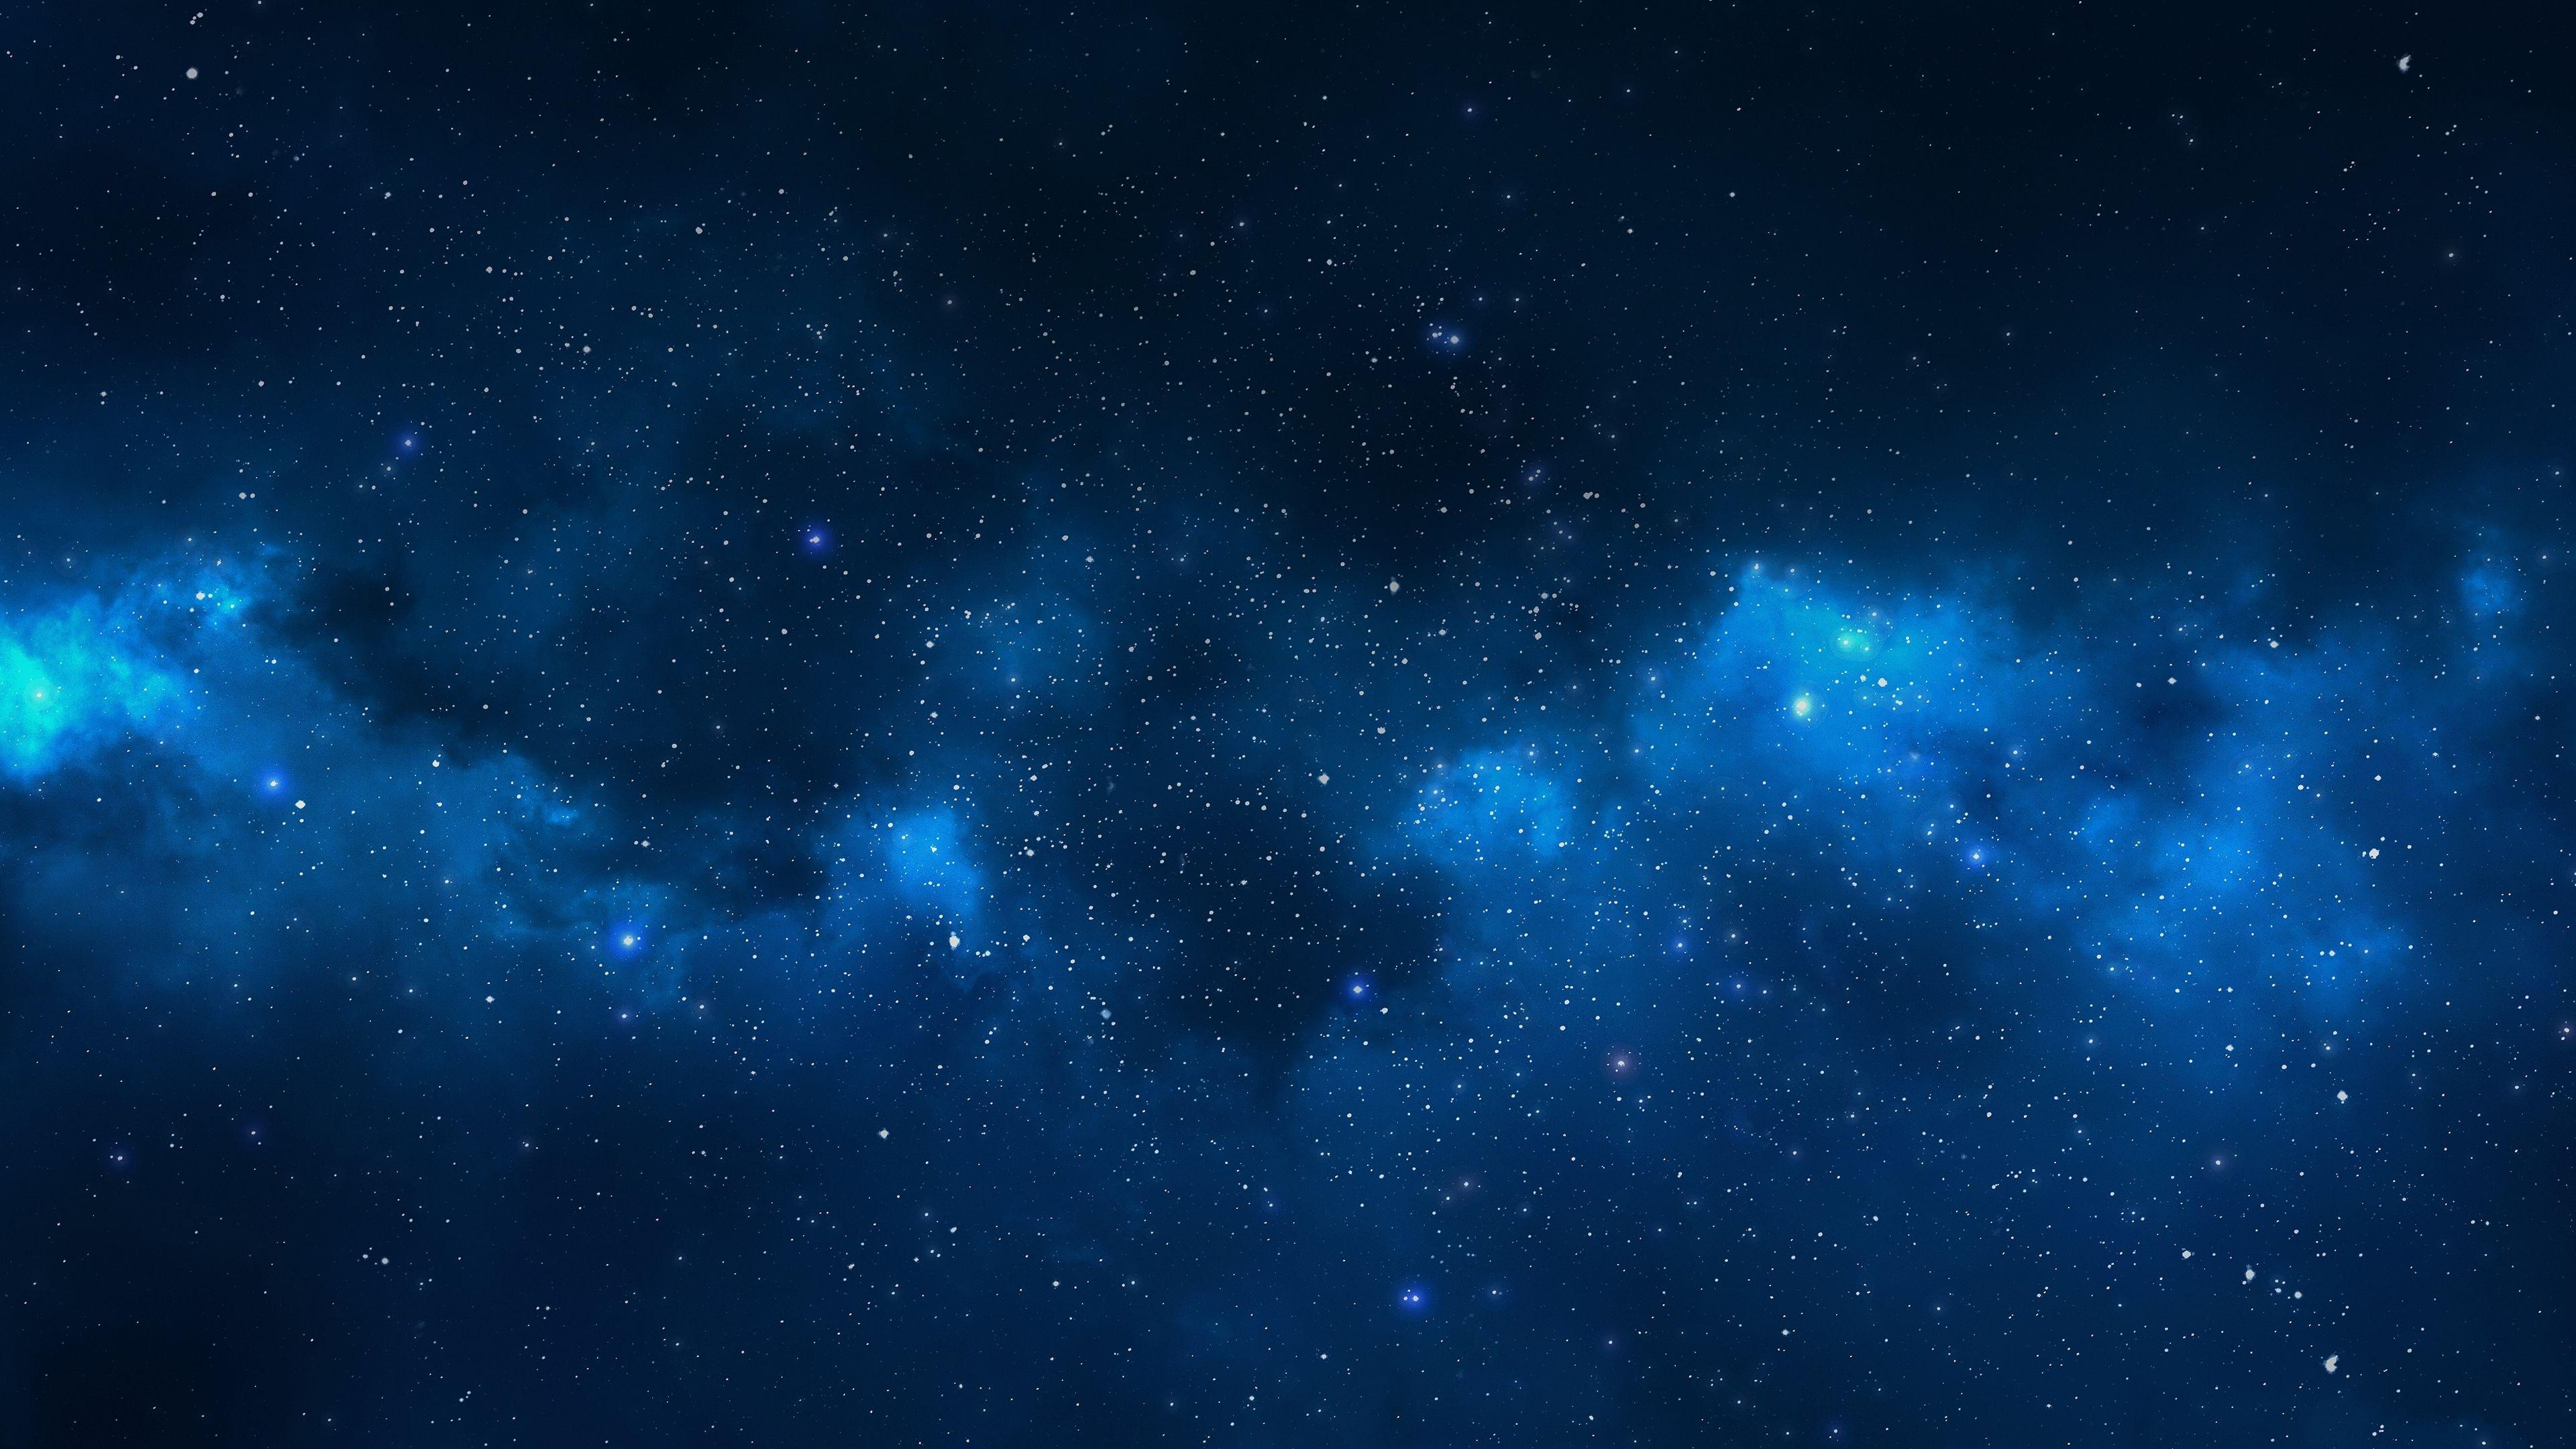 10 New 4k Galaxy Wallpaper Full Hd 1080p For Pc Background Computer Wallpaper Hd Galaxy Wallpaper Blue Galaxy Wallpaper